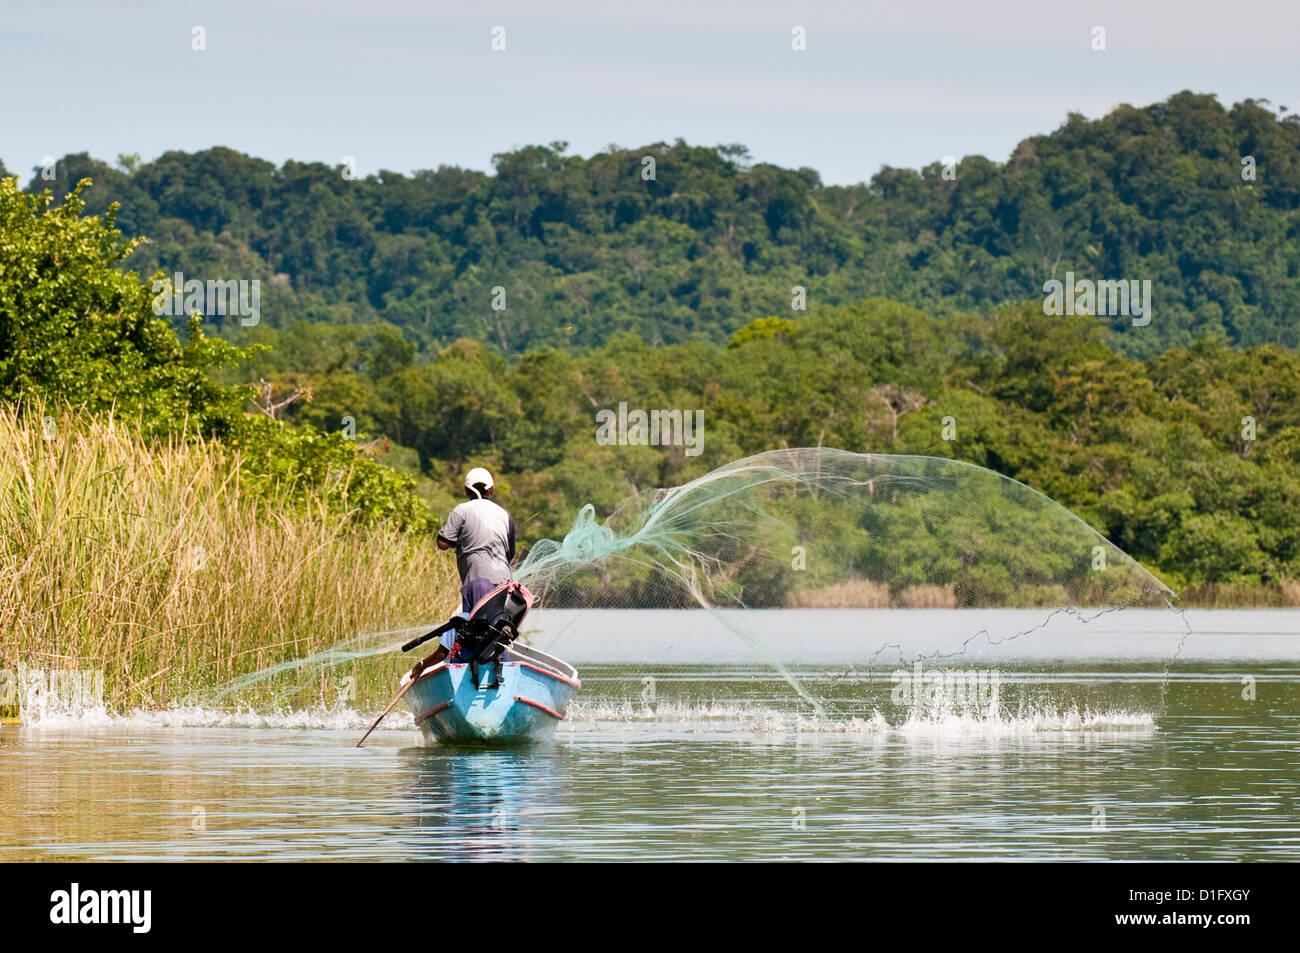 Pescador casting net en el lago de Izabal (Lago de Izabal, Guatemala, América Central Imagen De Stock